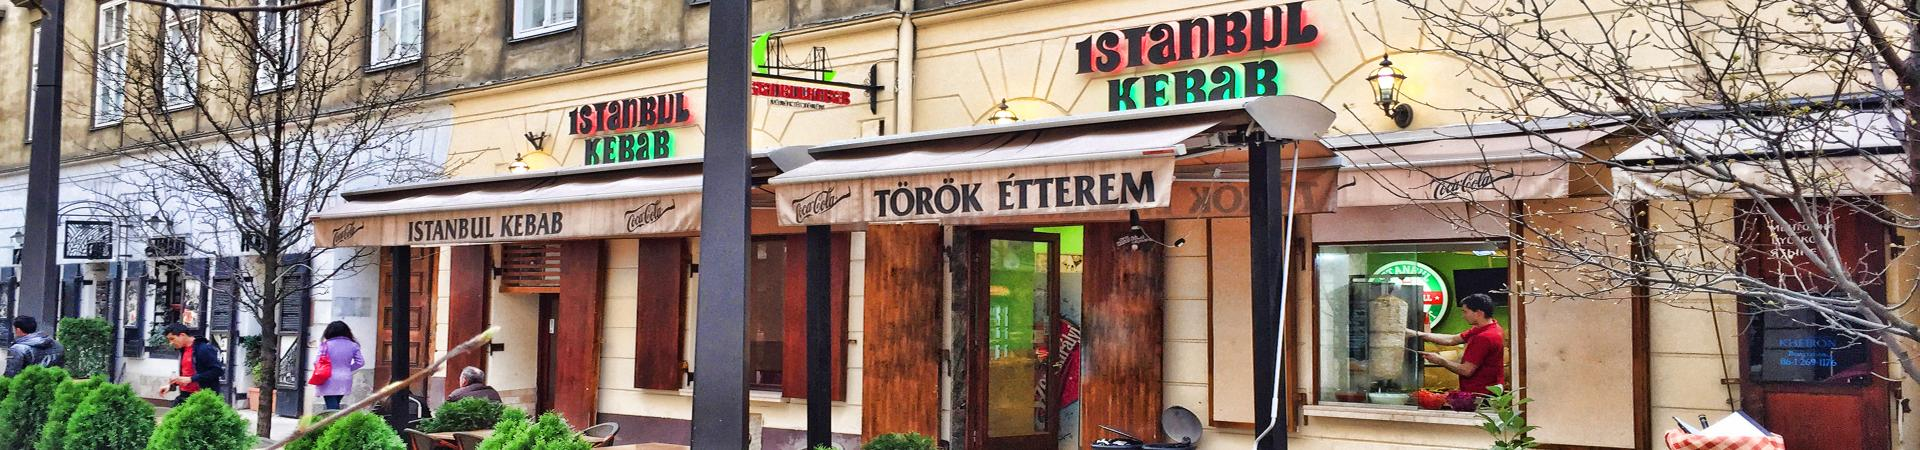 istanbul-fejlec.jpg